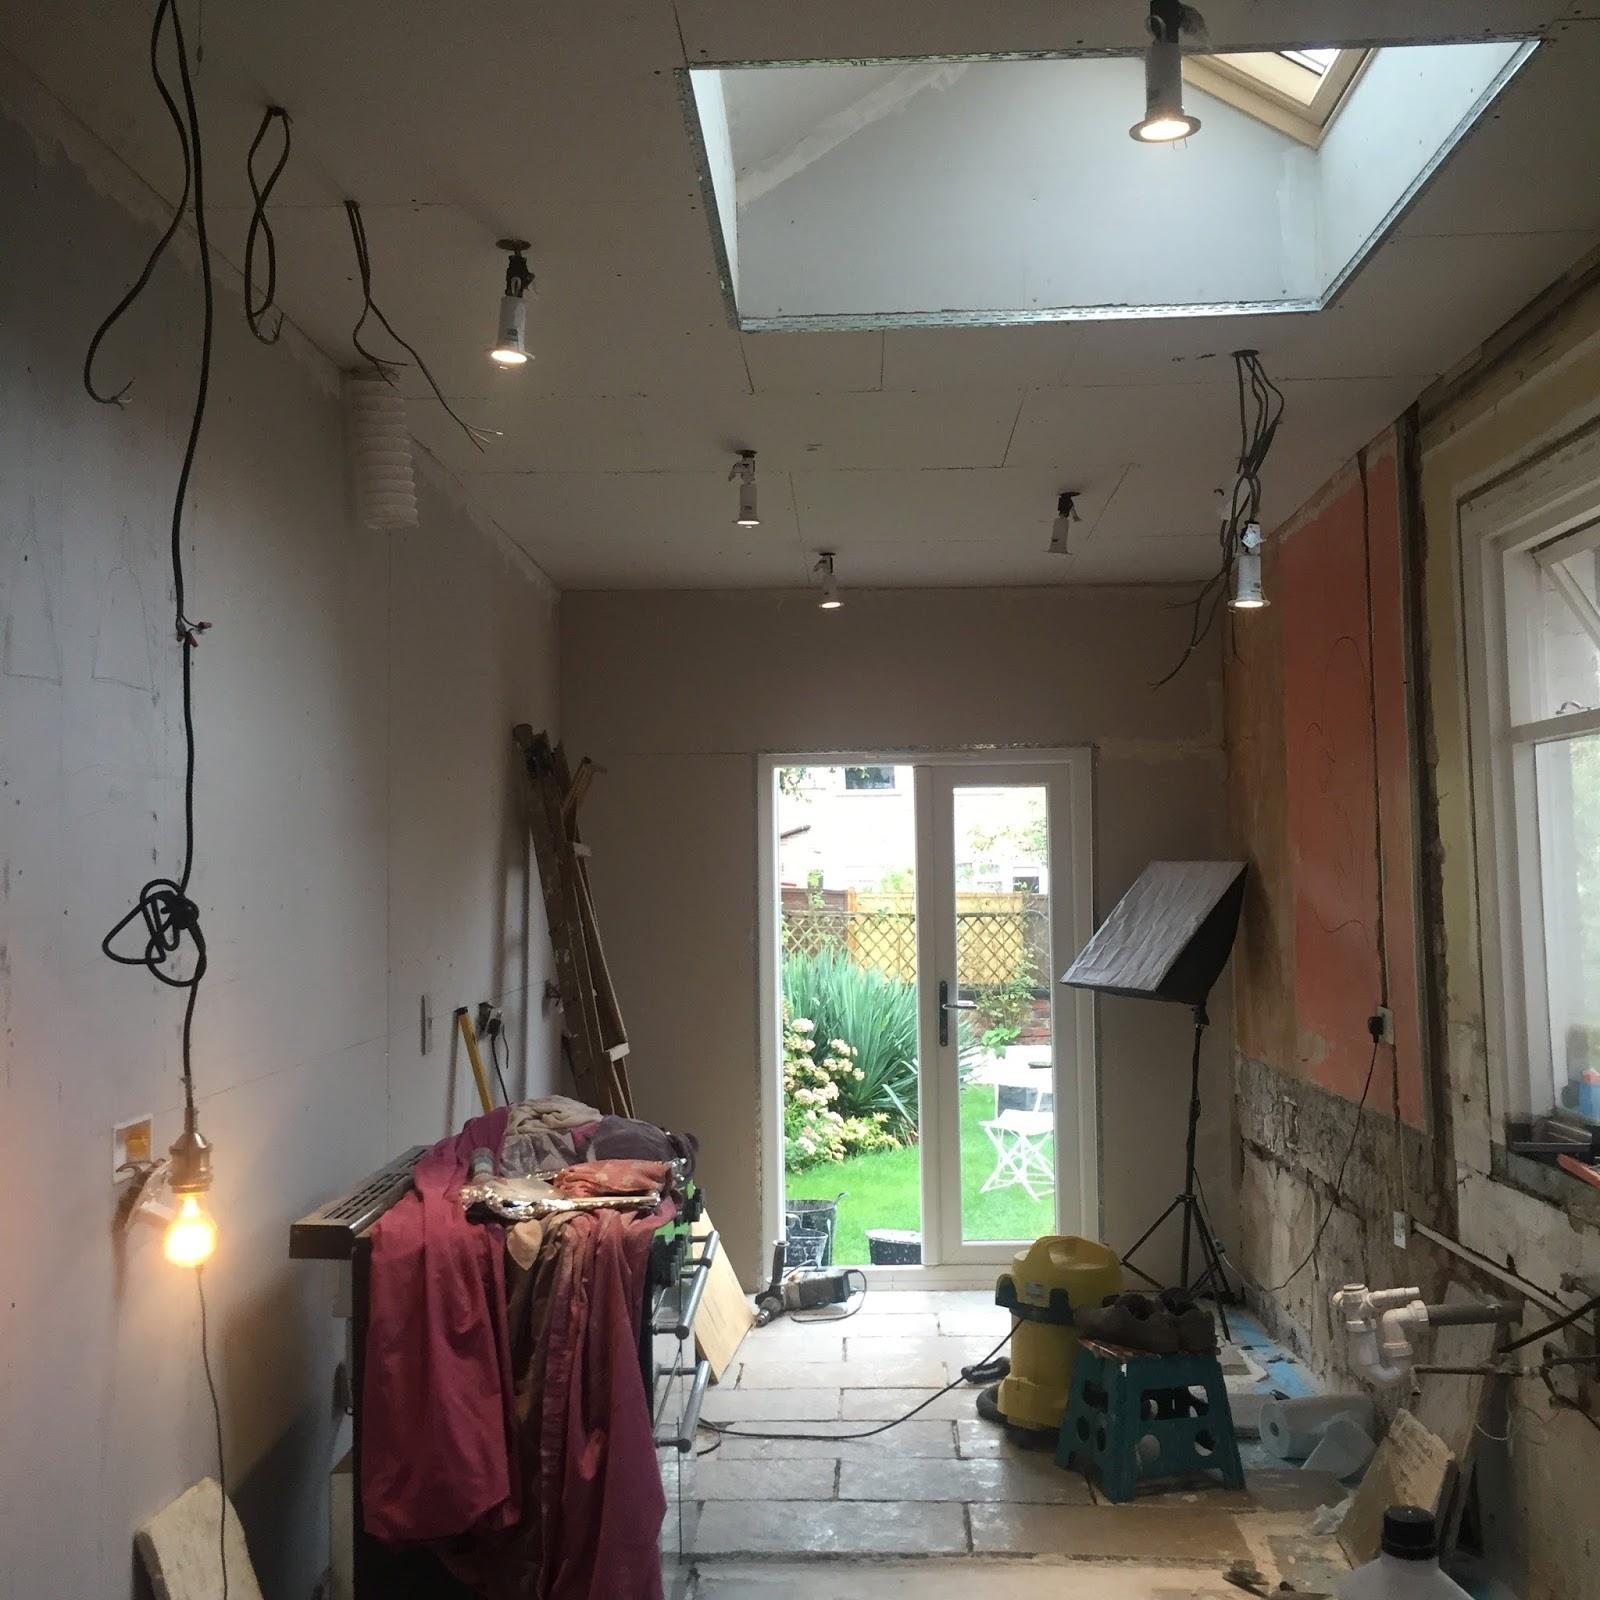 Kezzabeth.co.uk   UK Home Renovation, Interiors and DIY Blog